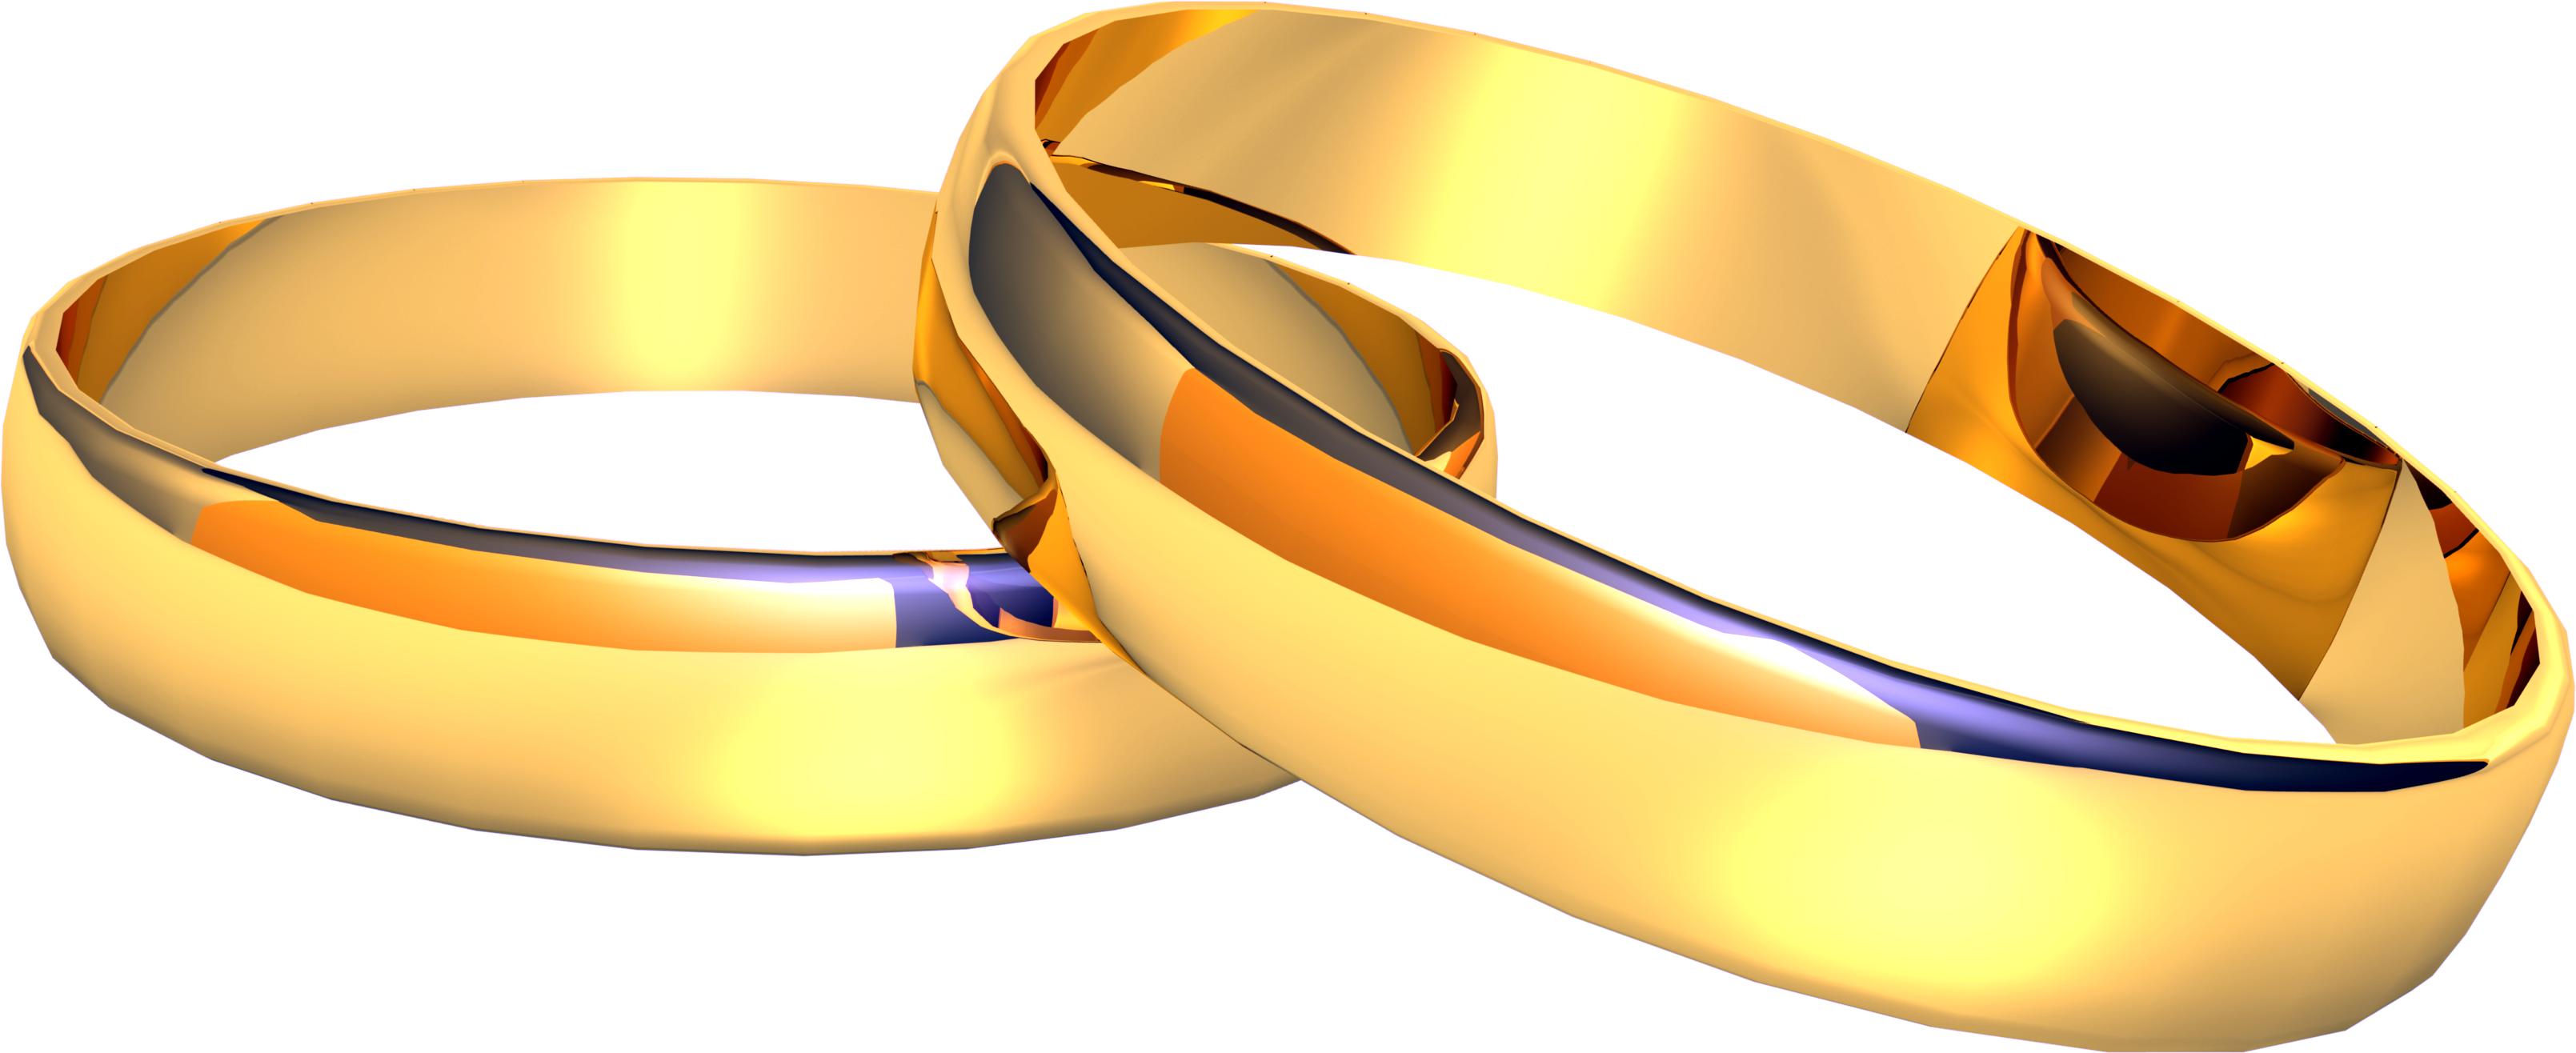 Wedding Png Image PNG Image -